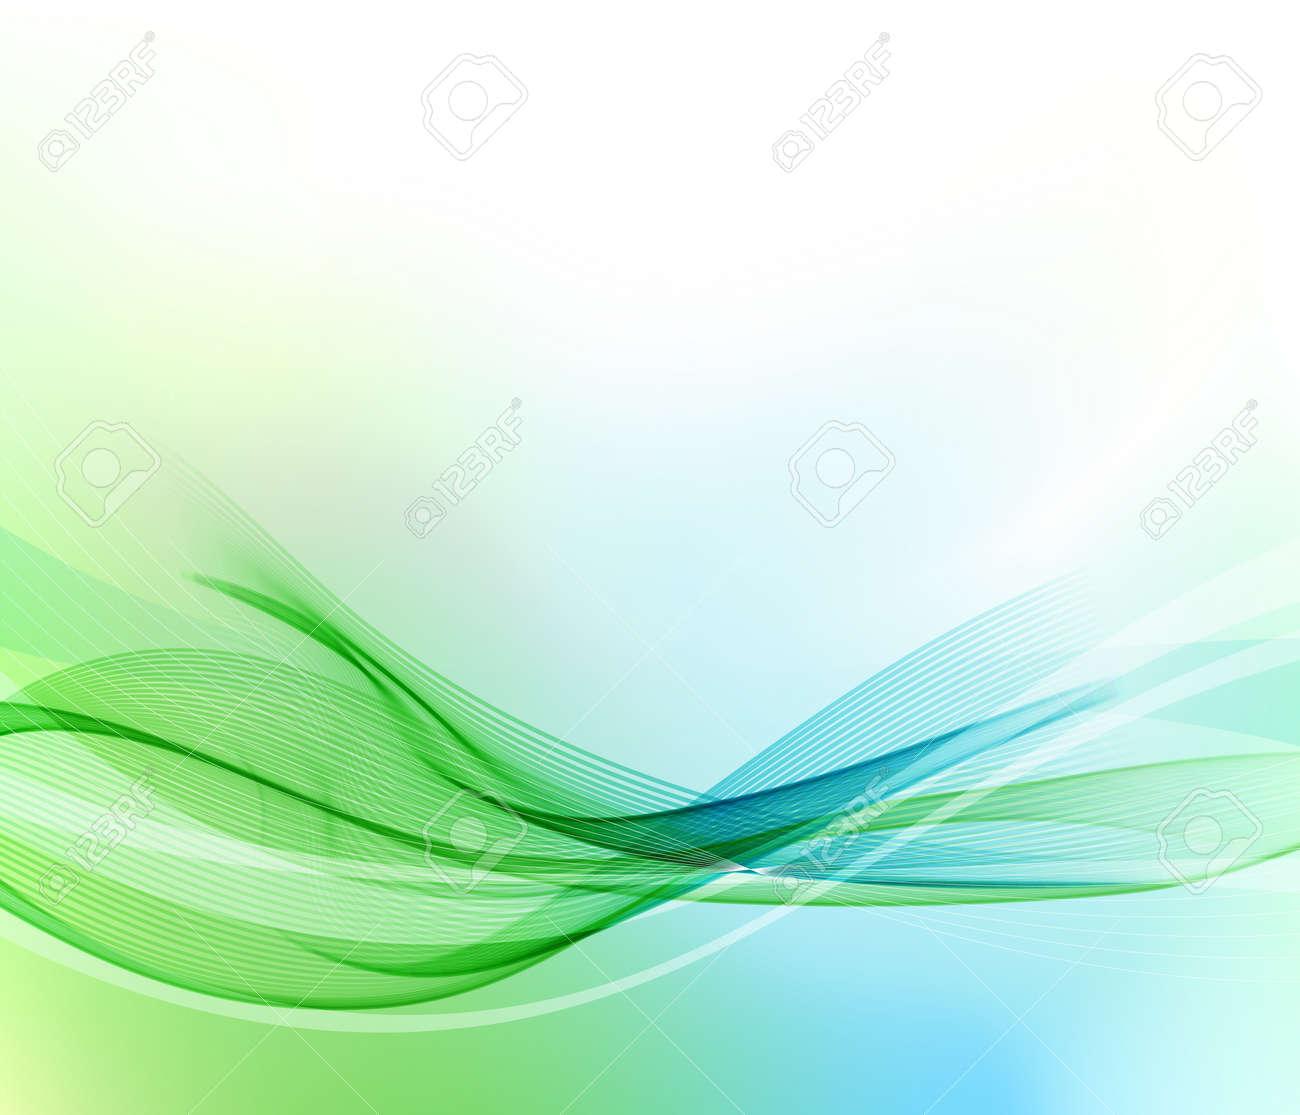 Download 108 Background Blue And Green Gratis Terbaik